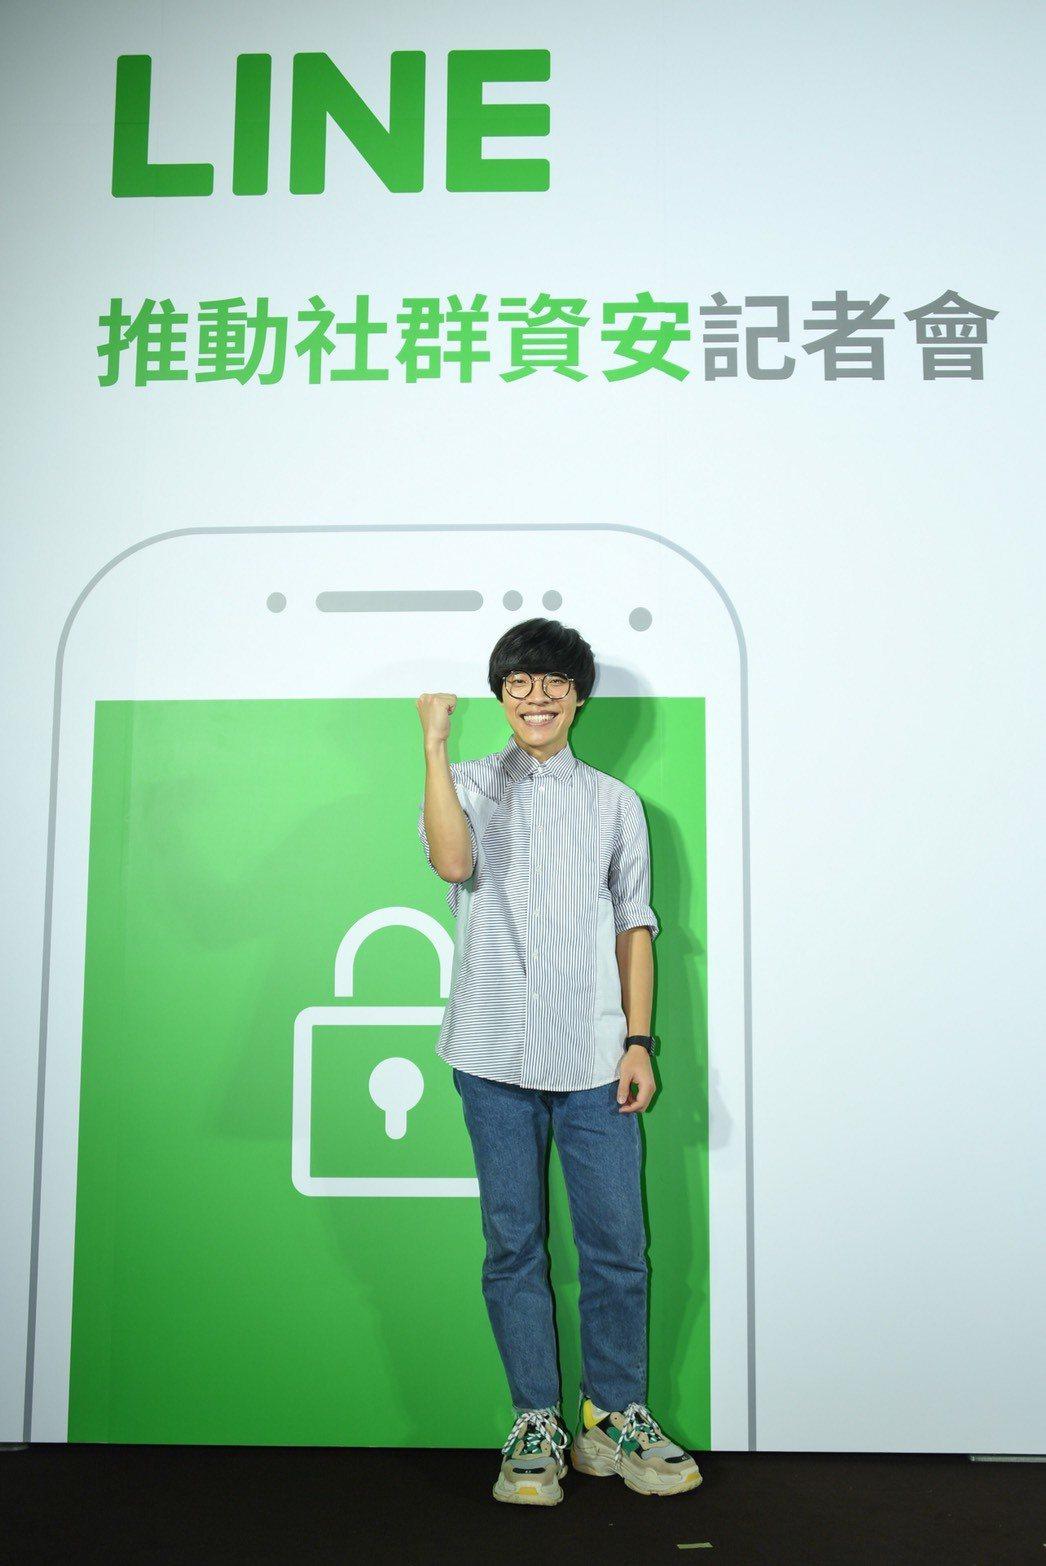 LINE展開「推動社群資安運動」,邀請盧廣仲擔任資安小隊長。圖/LINE提供